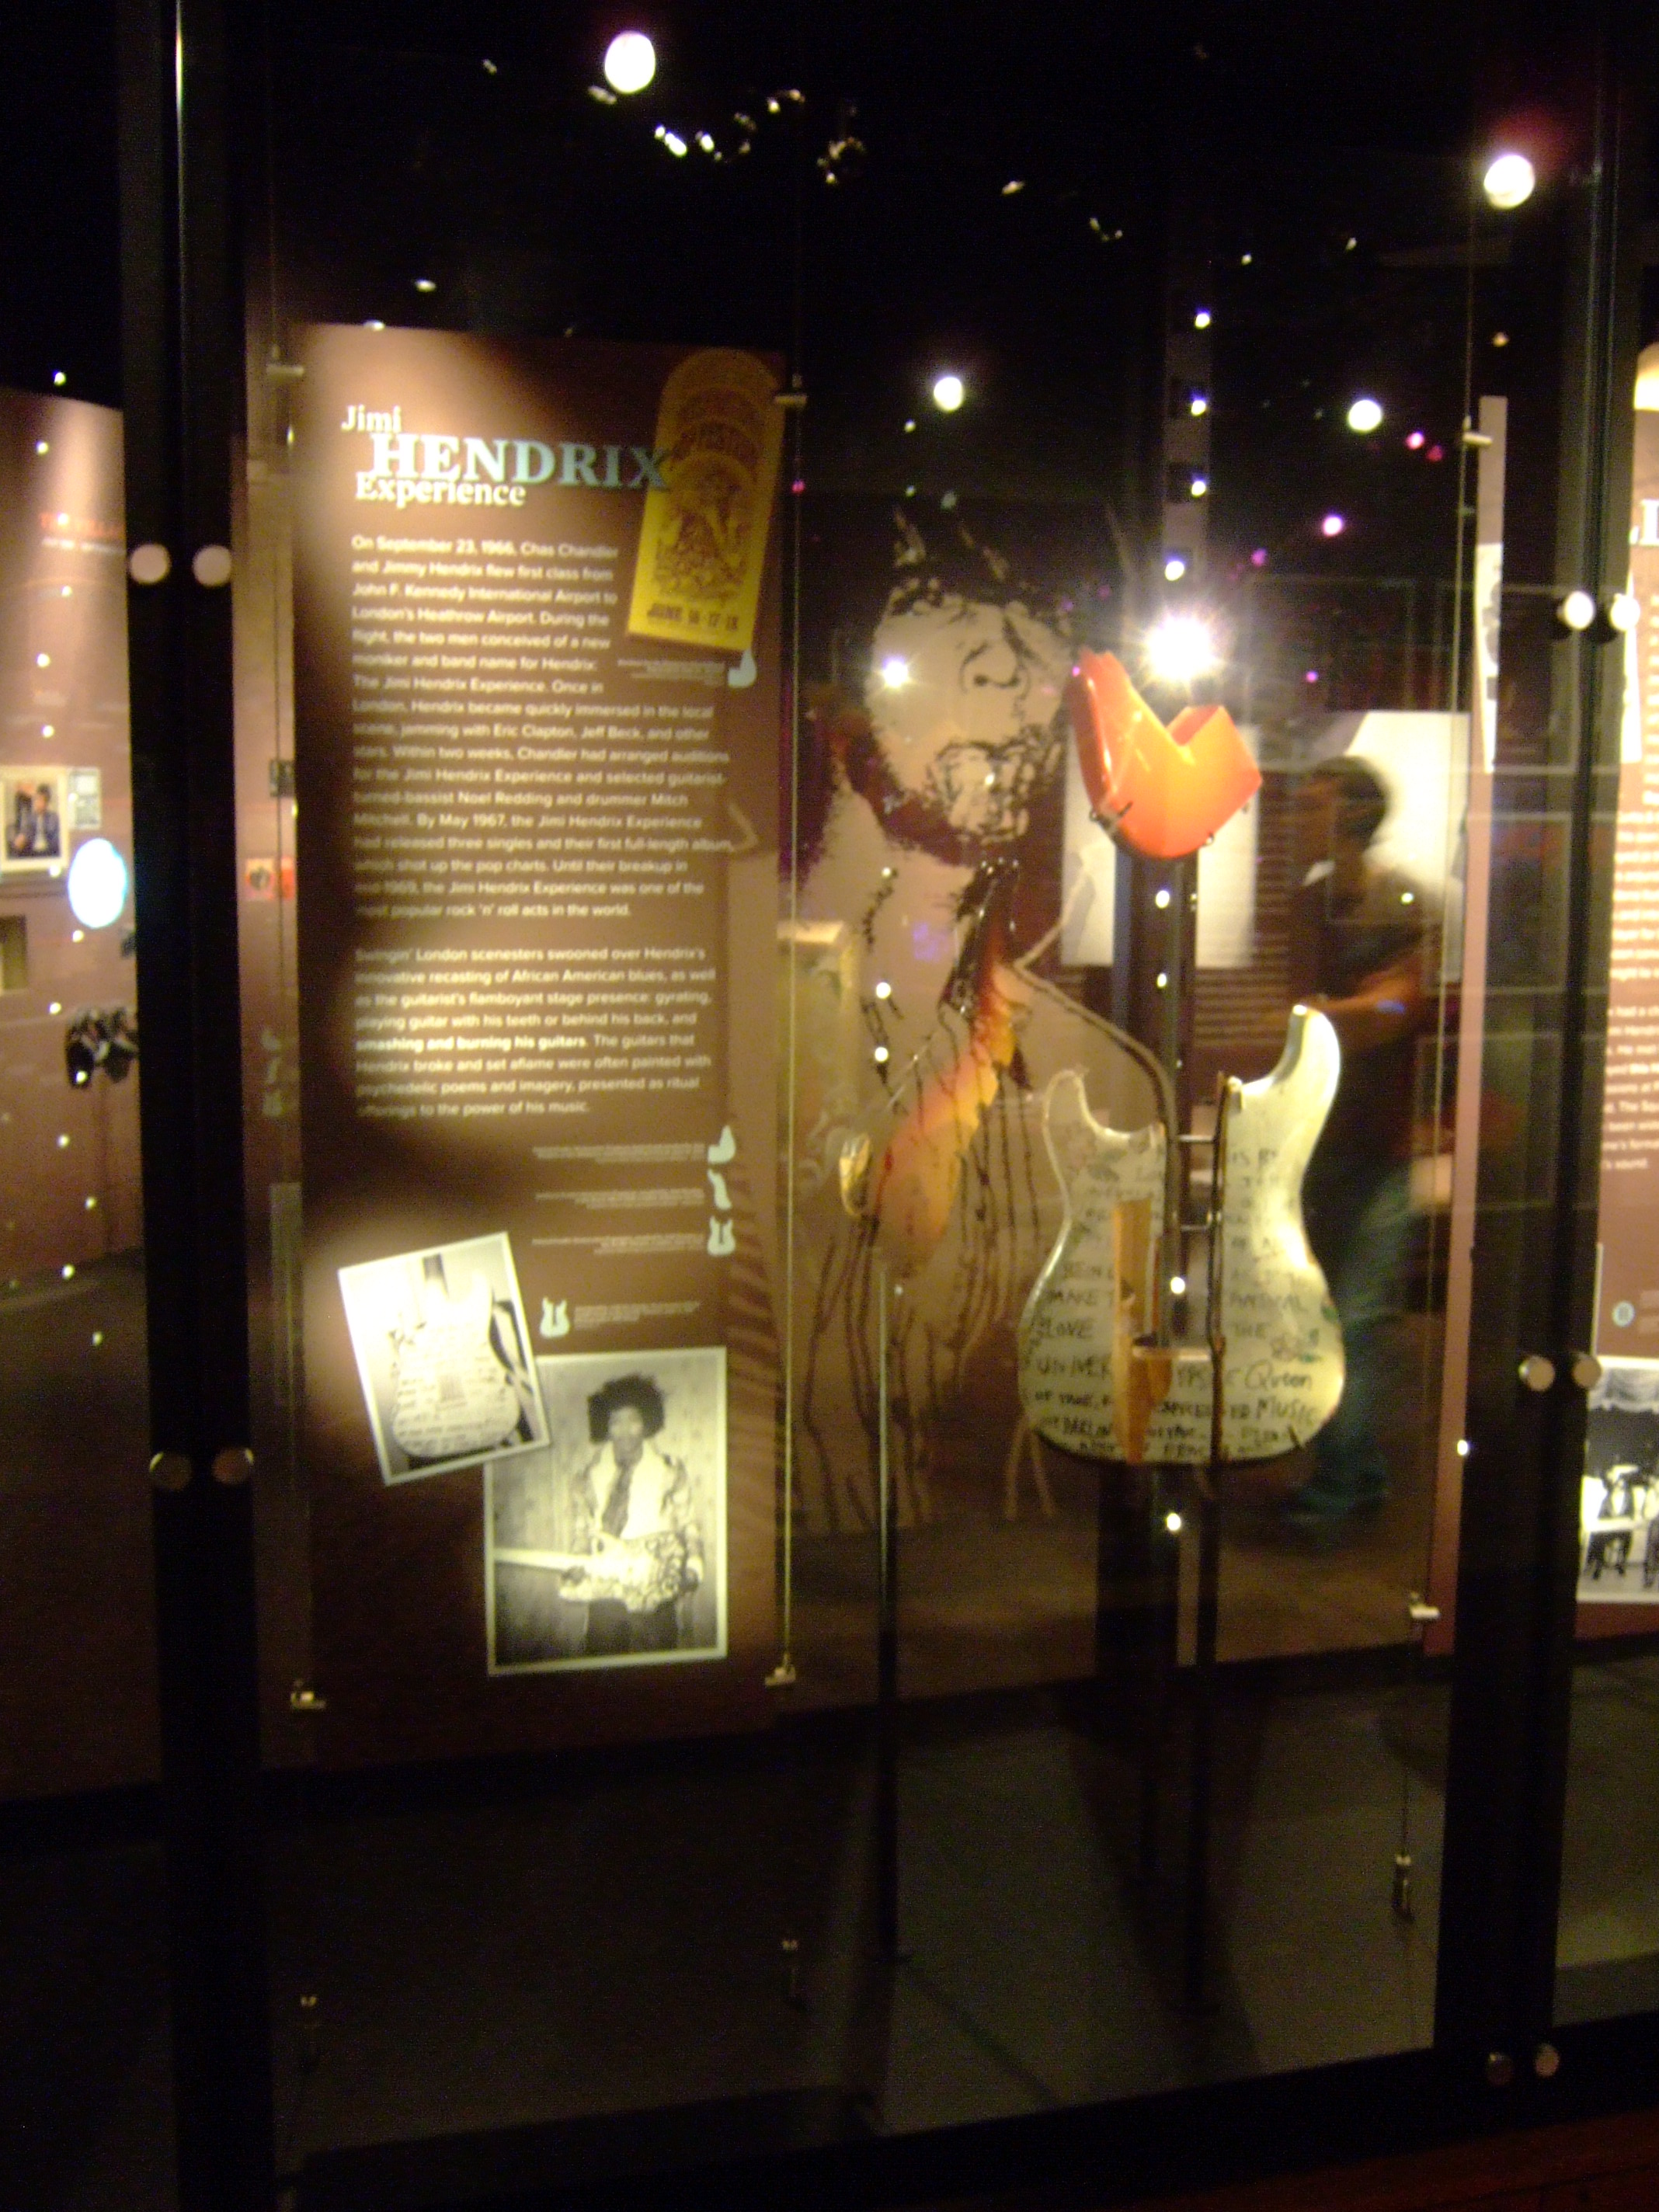 FileJimi Hendrix smashing guitar pieces rear EMP